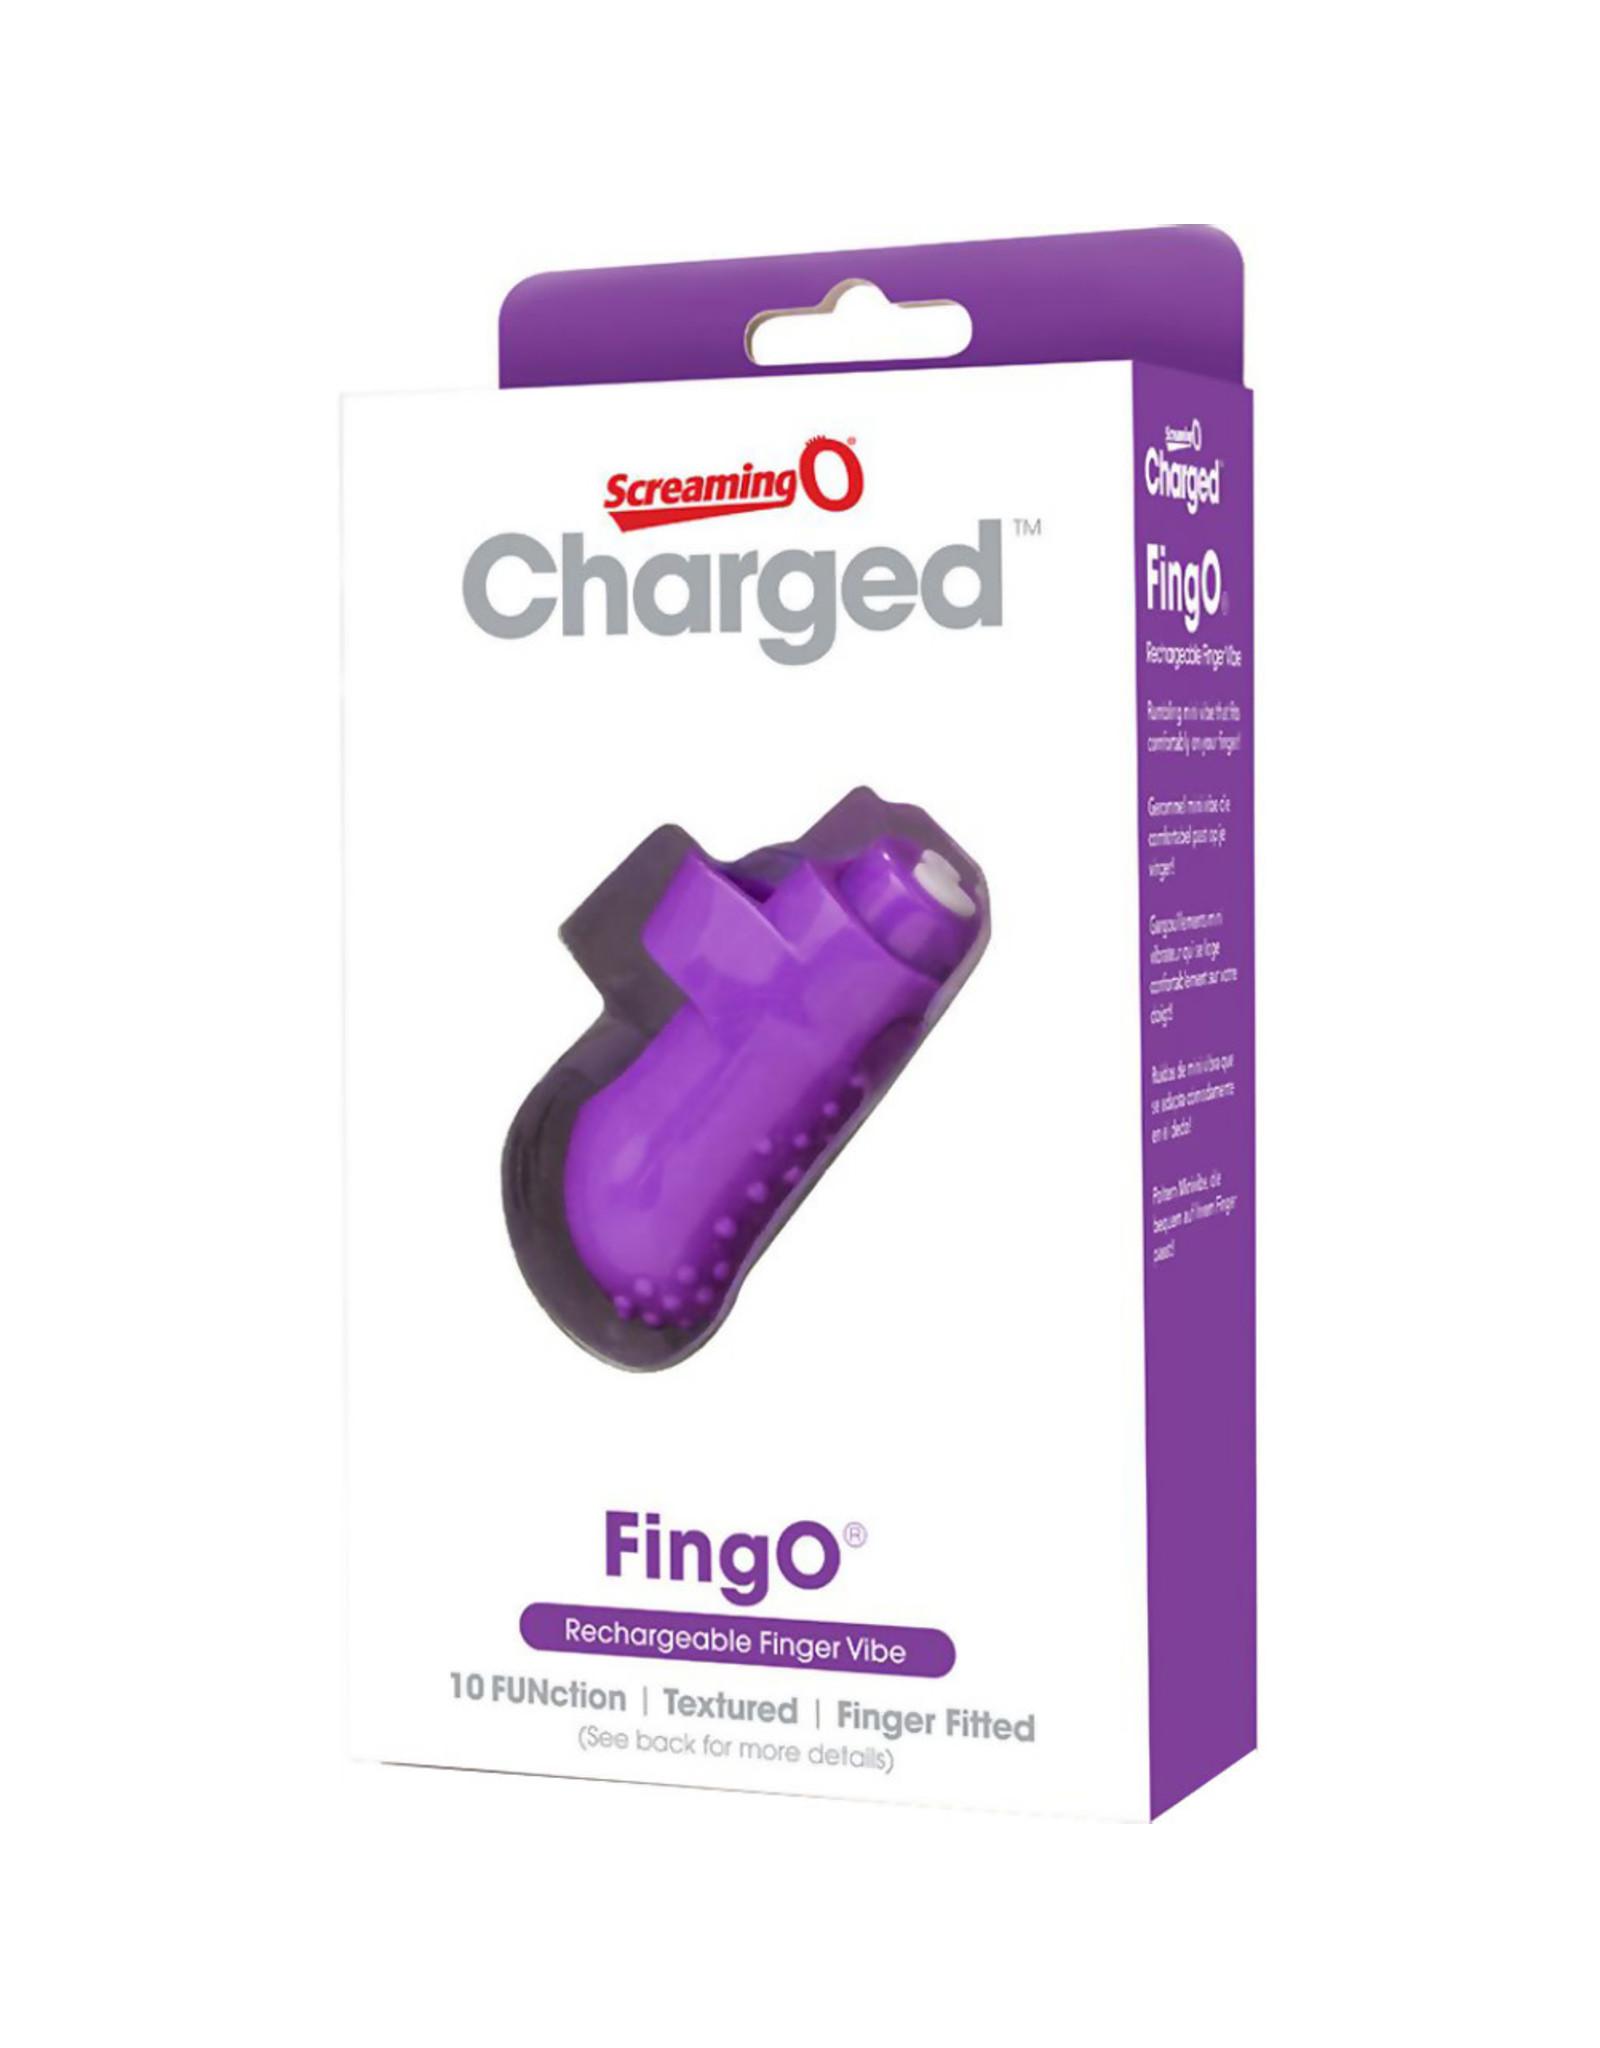 Screaming O Screaming O FingO Charged Vibe Purple